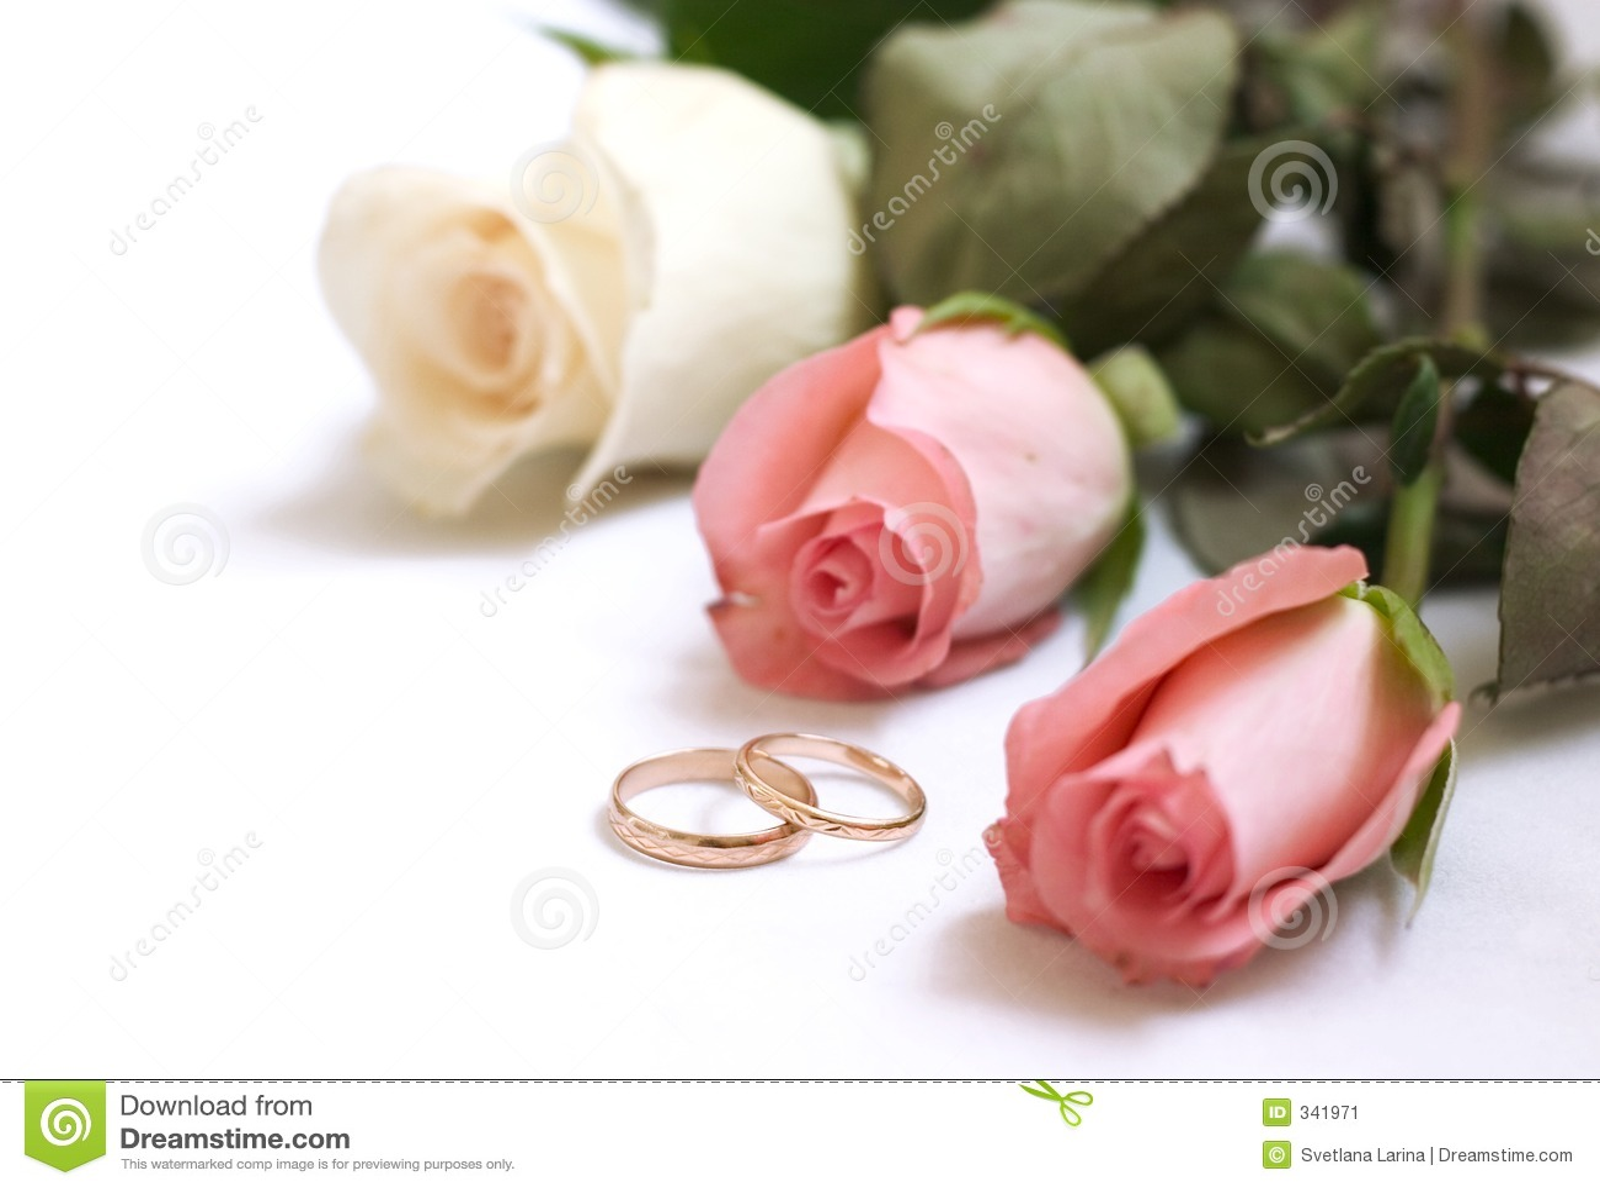 https fr dreamstime com image stock carte d invitation mariage image341971